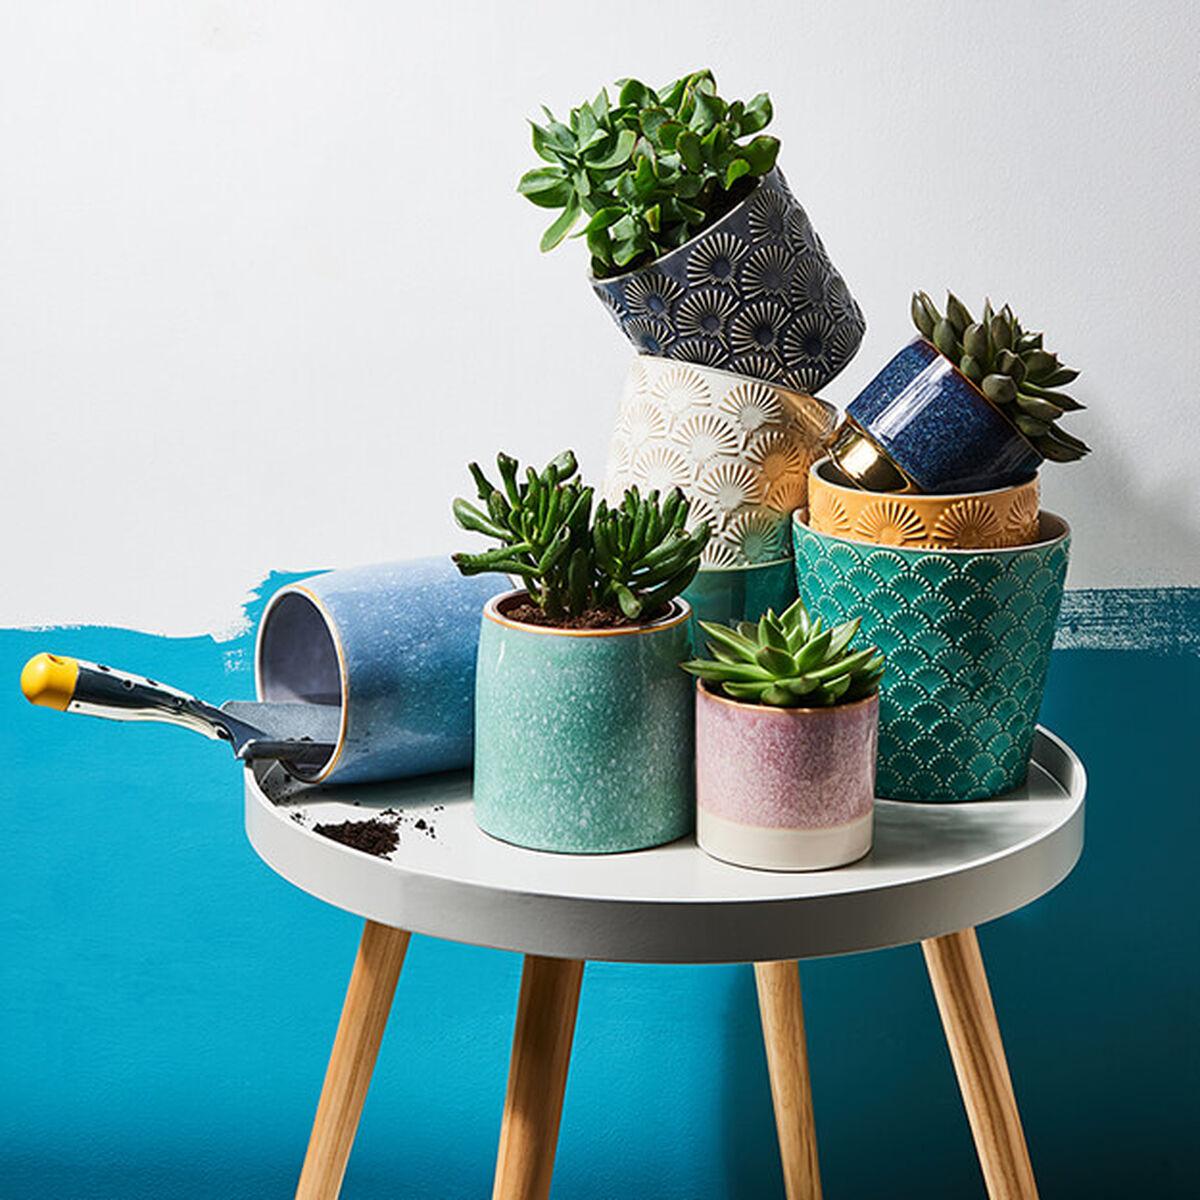 blument pfe pflanzent pfe online kaufen butlers. Black Bedroom Furniture Sets. Home Design Ideas